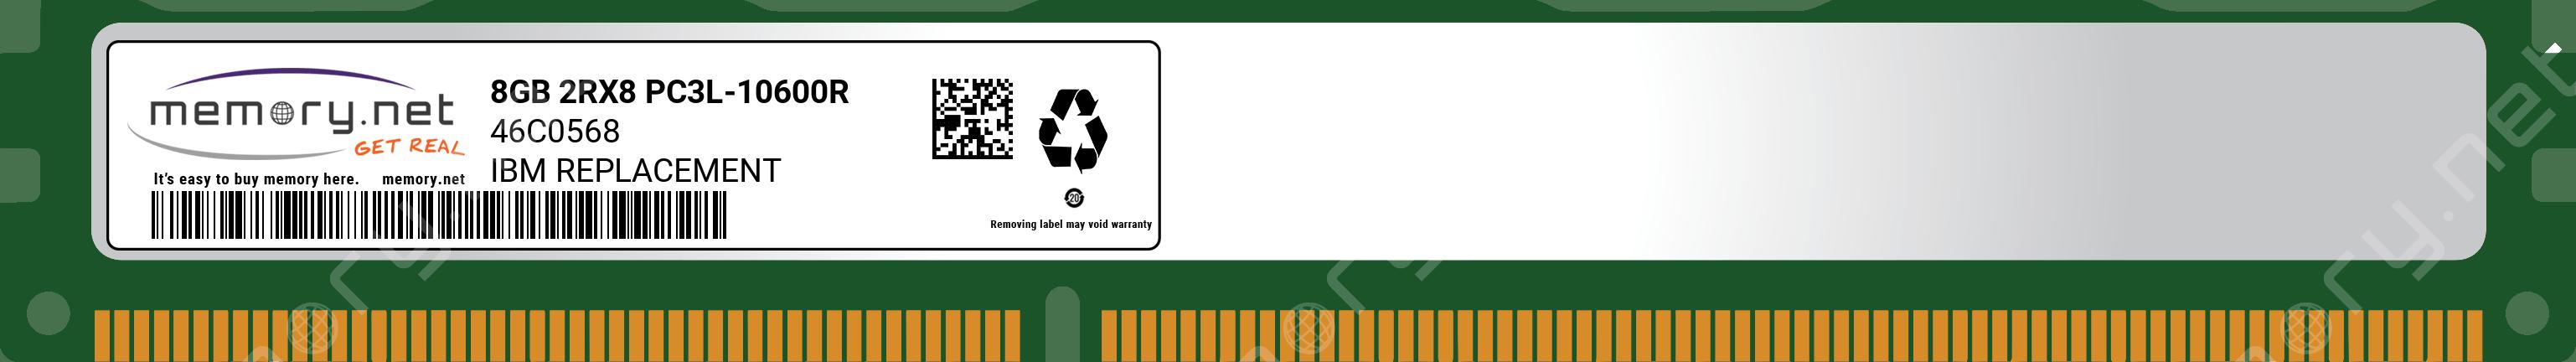 46C0568